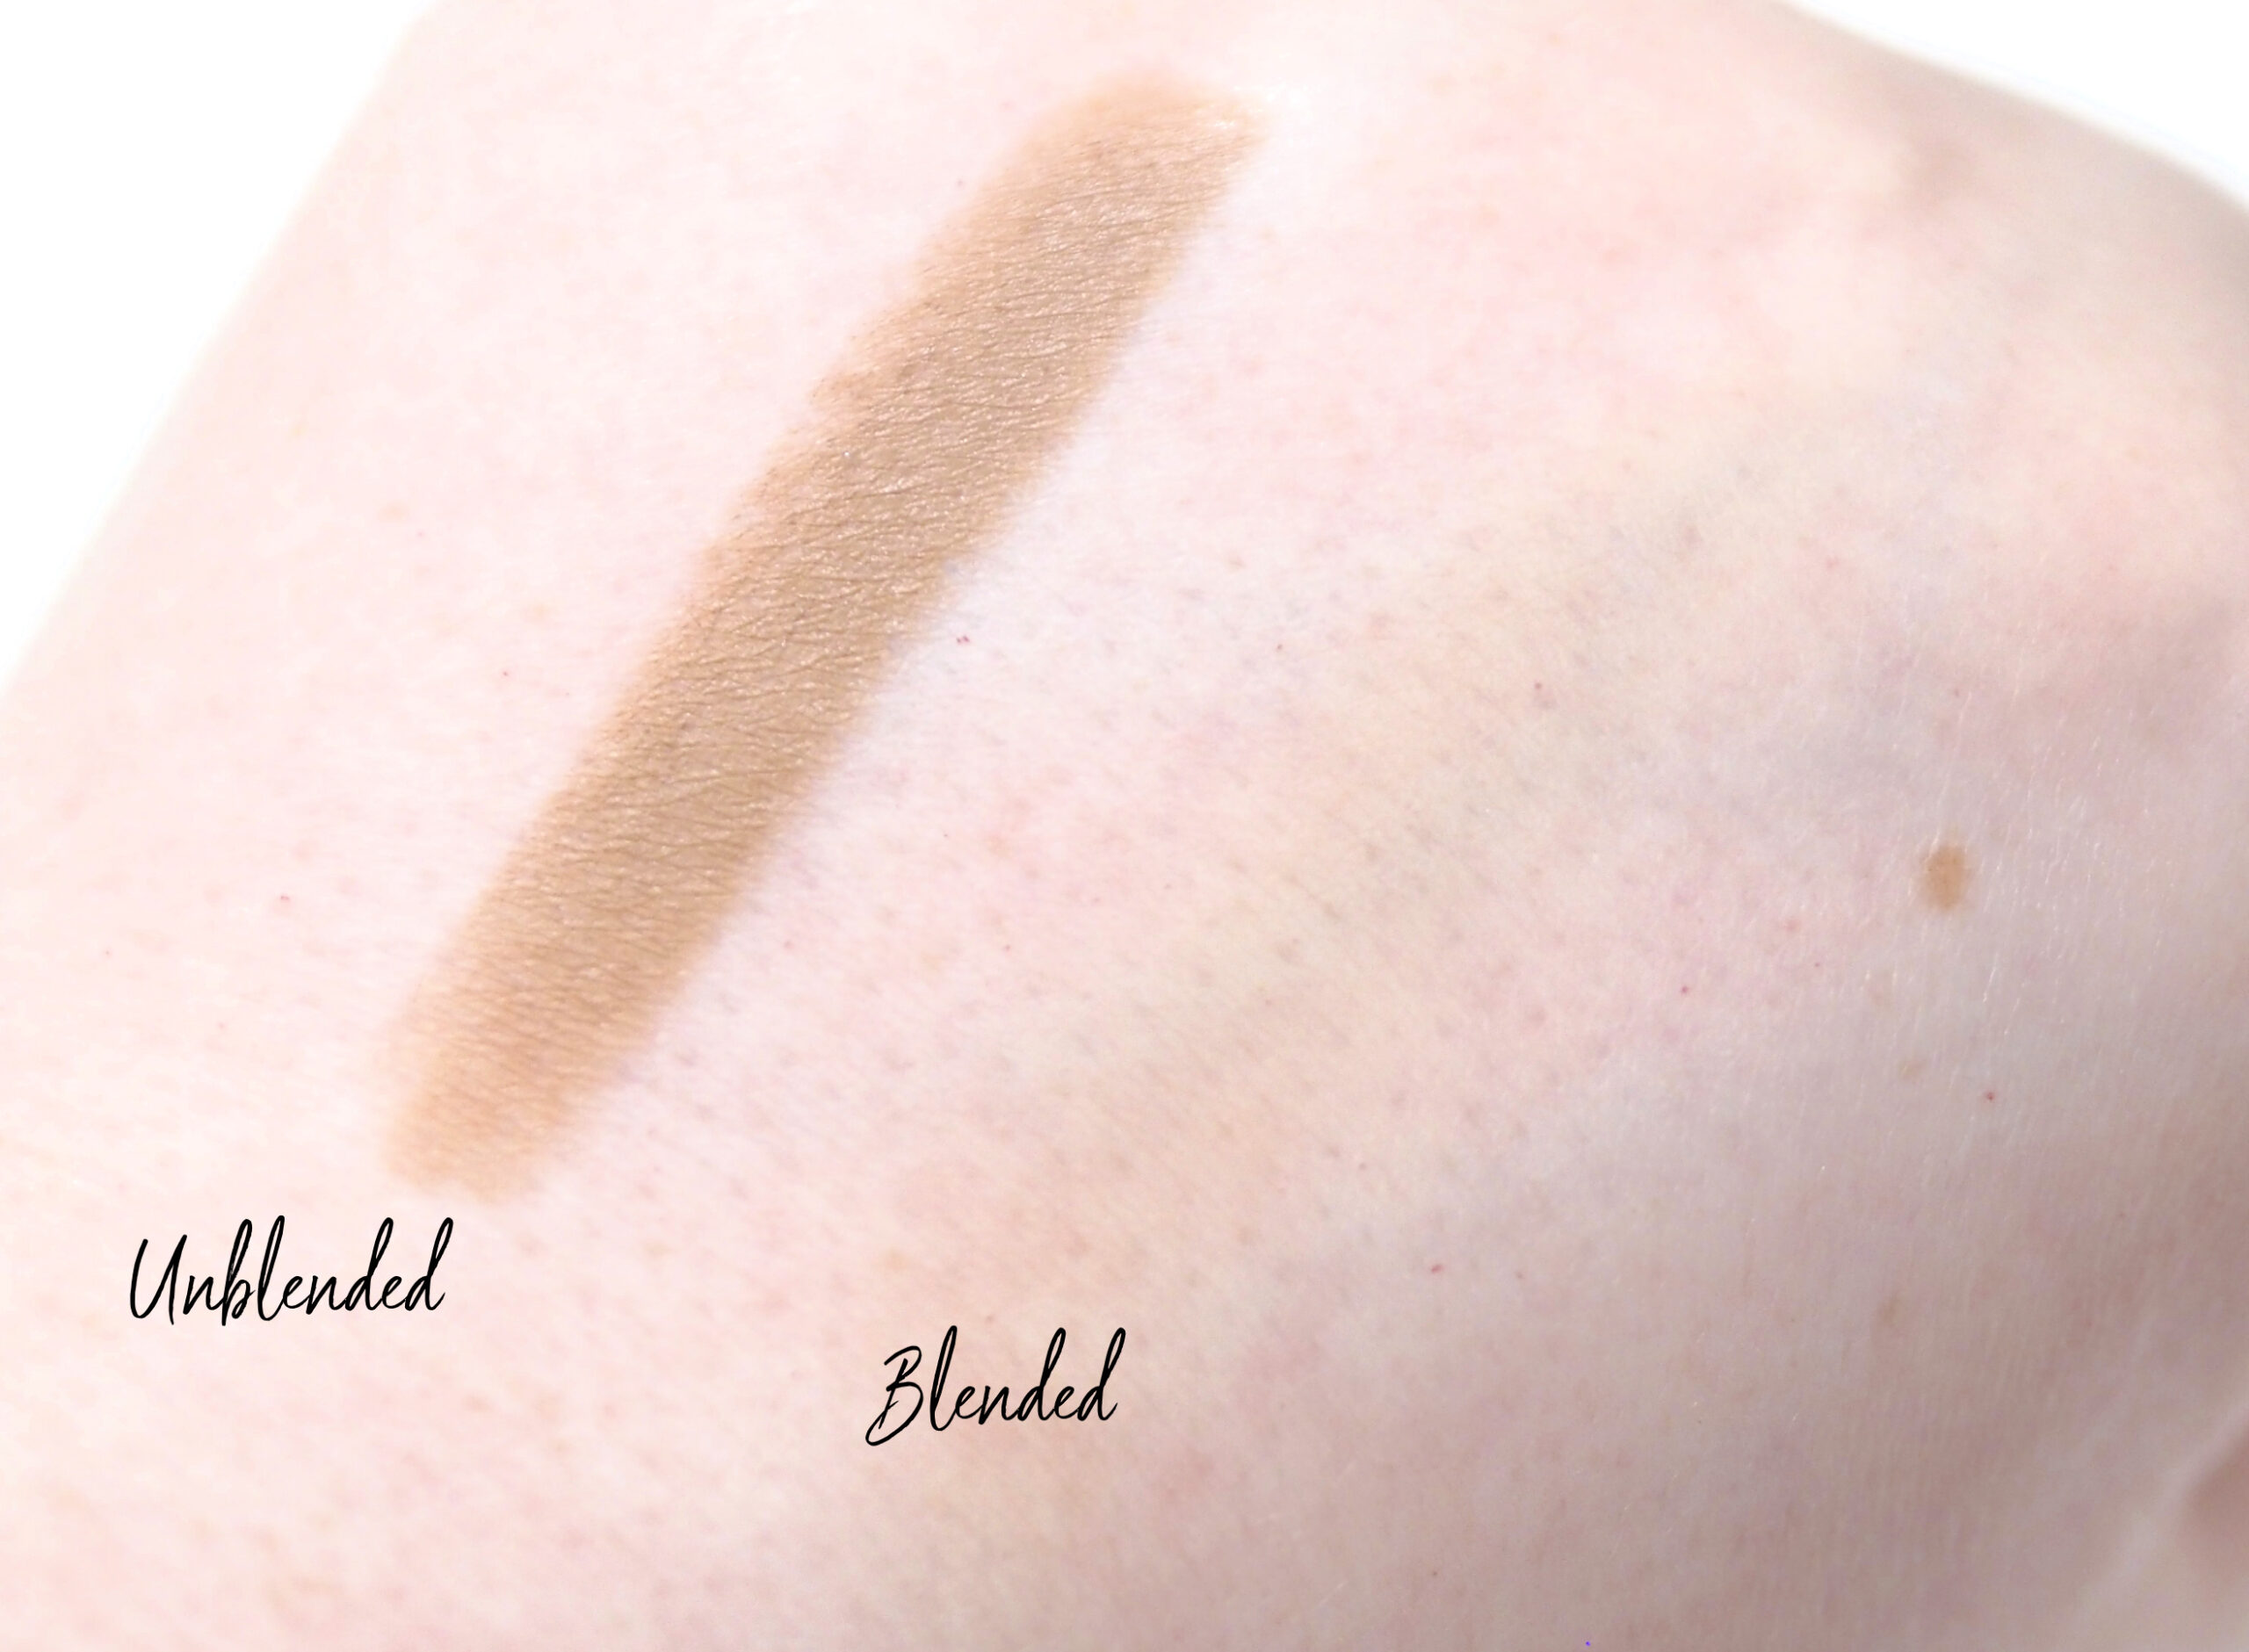 Fenty Beauty Match Stix Contour Skinstick Review / Swatches